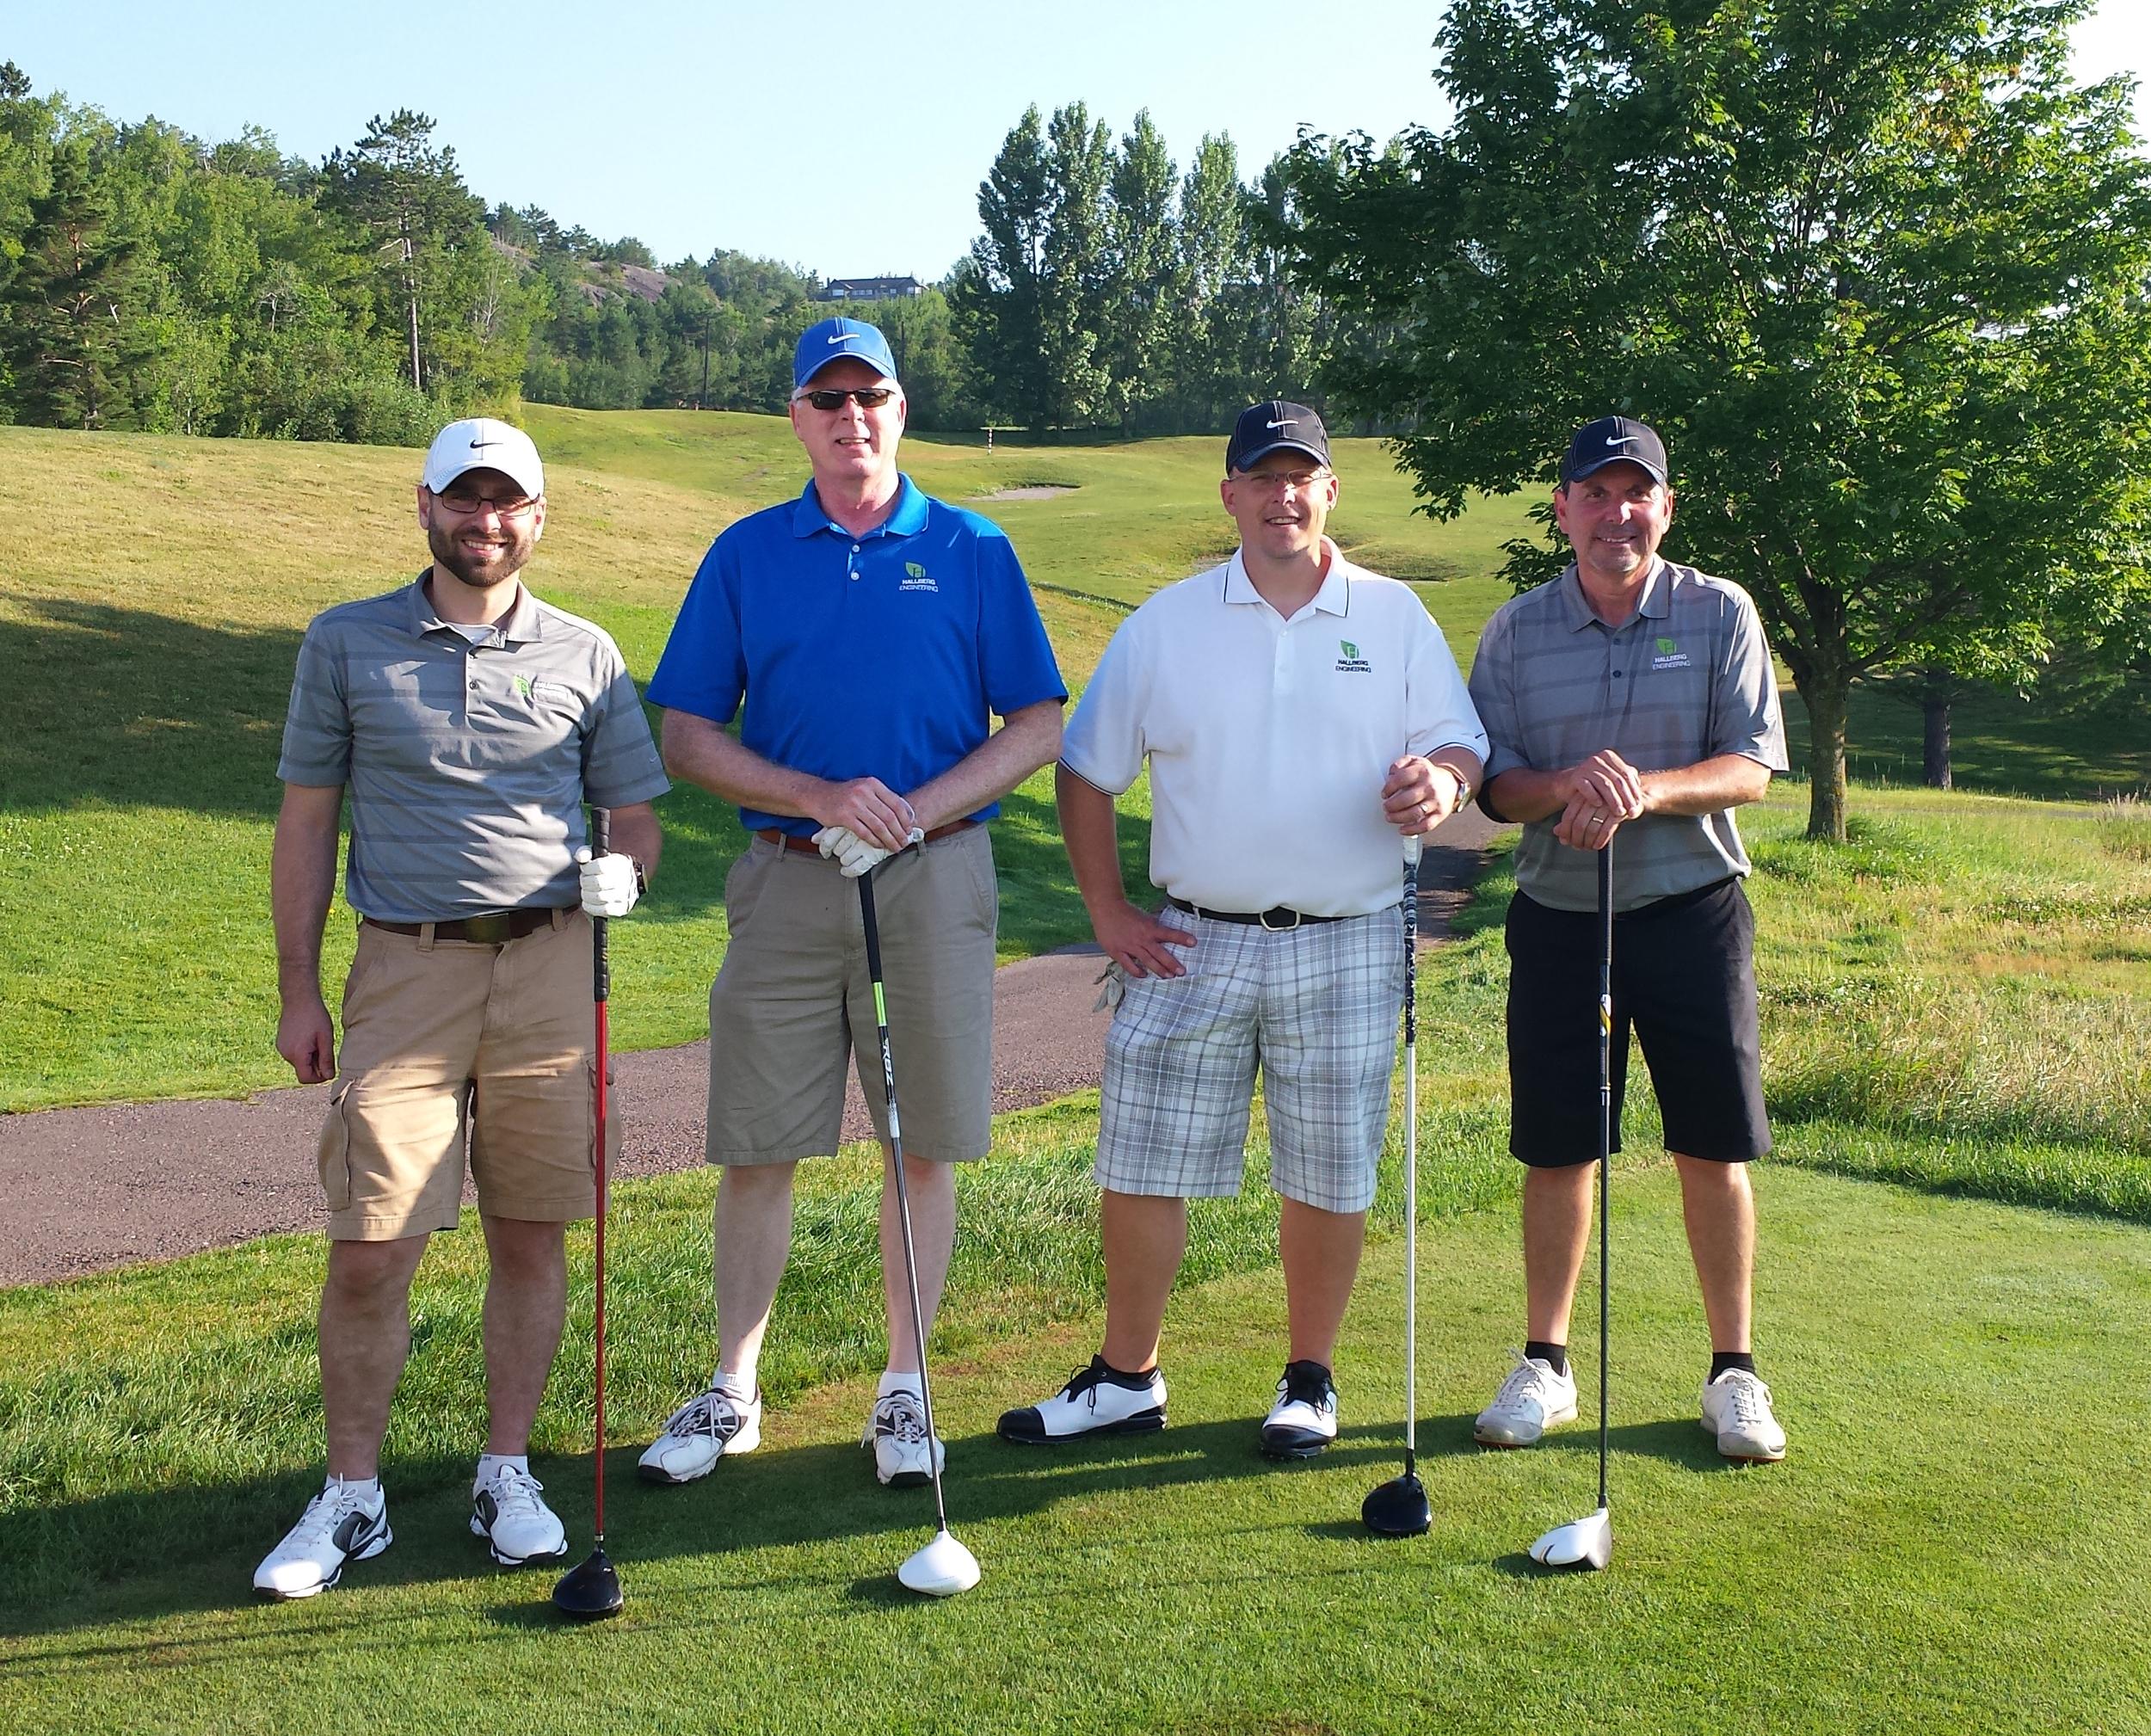 Ryan Lindahl, Mike Jones, Paul Fettinger & Rick Lucio